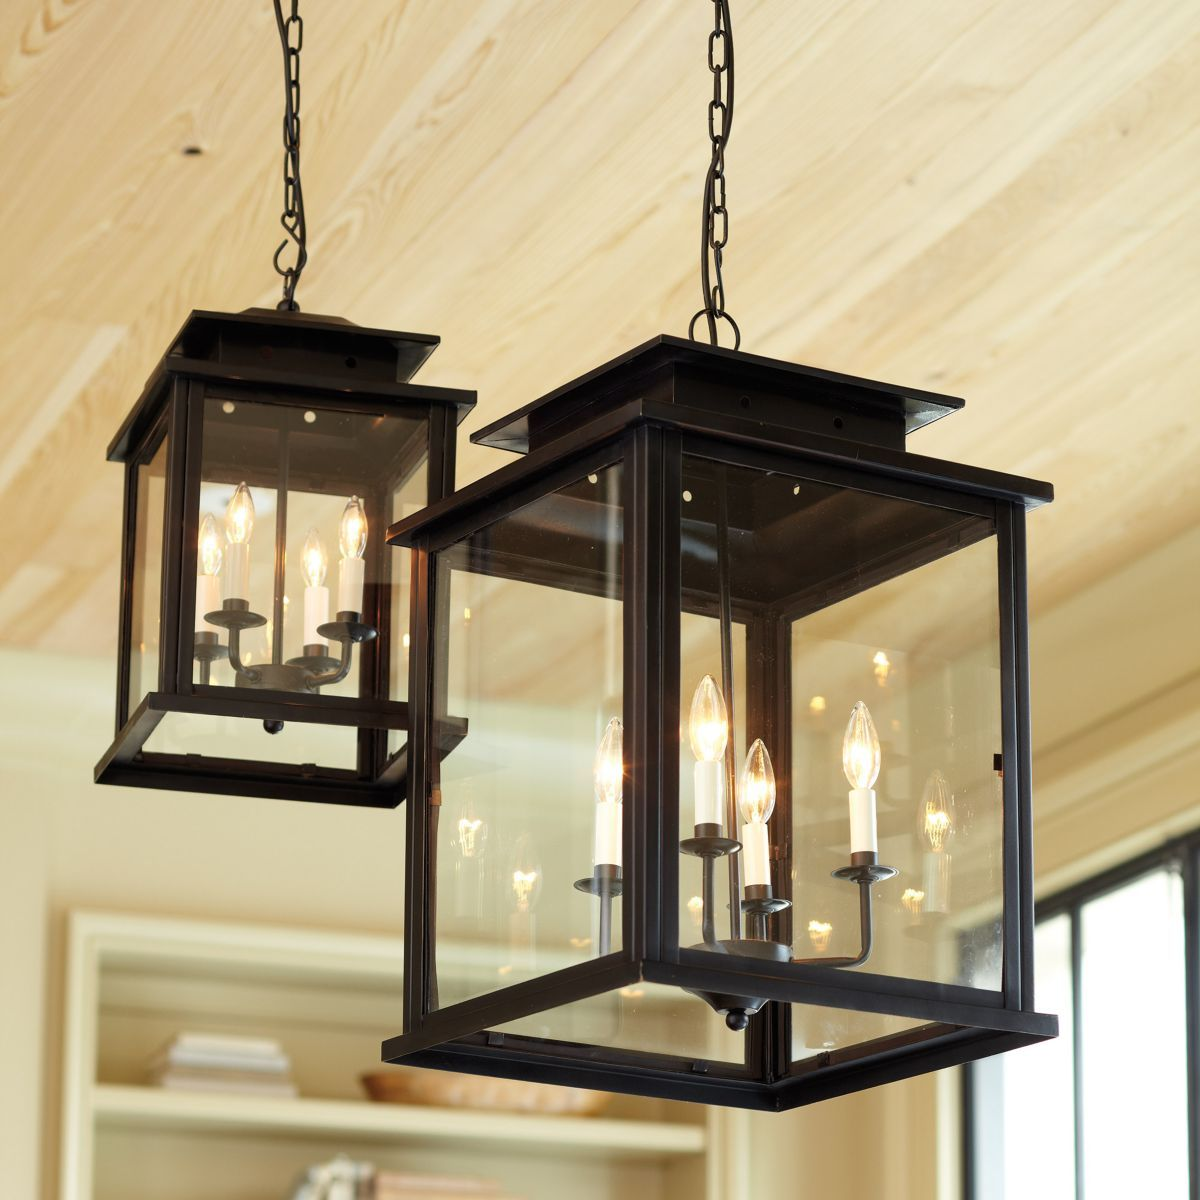 Calisse 4 light lantern